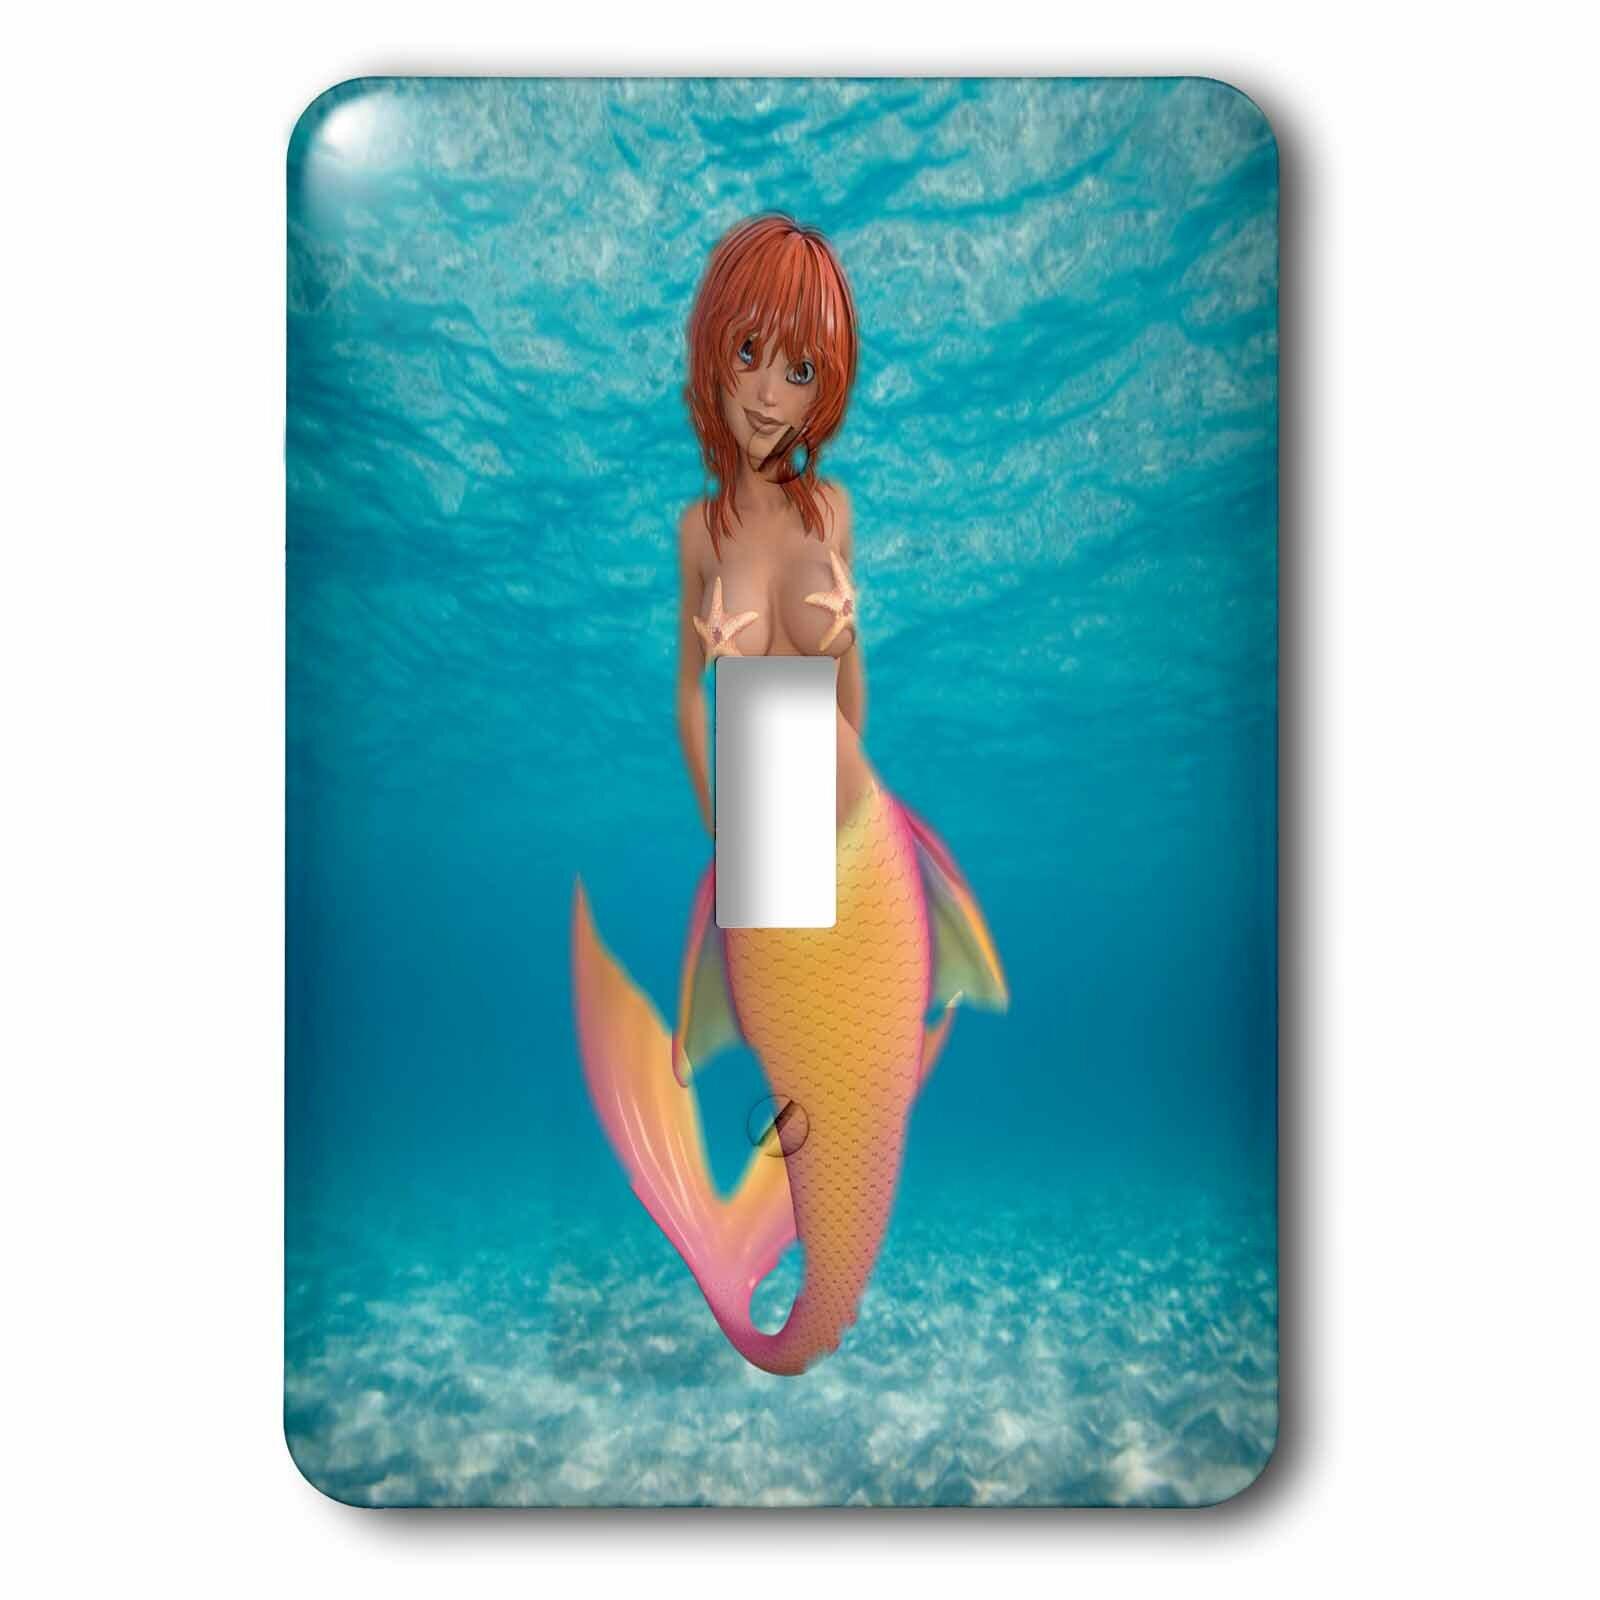 3drose Mermaid 1 Gang Toggle Light Switch Wall Plate Wayfair